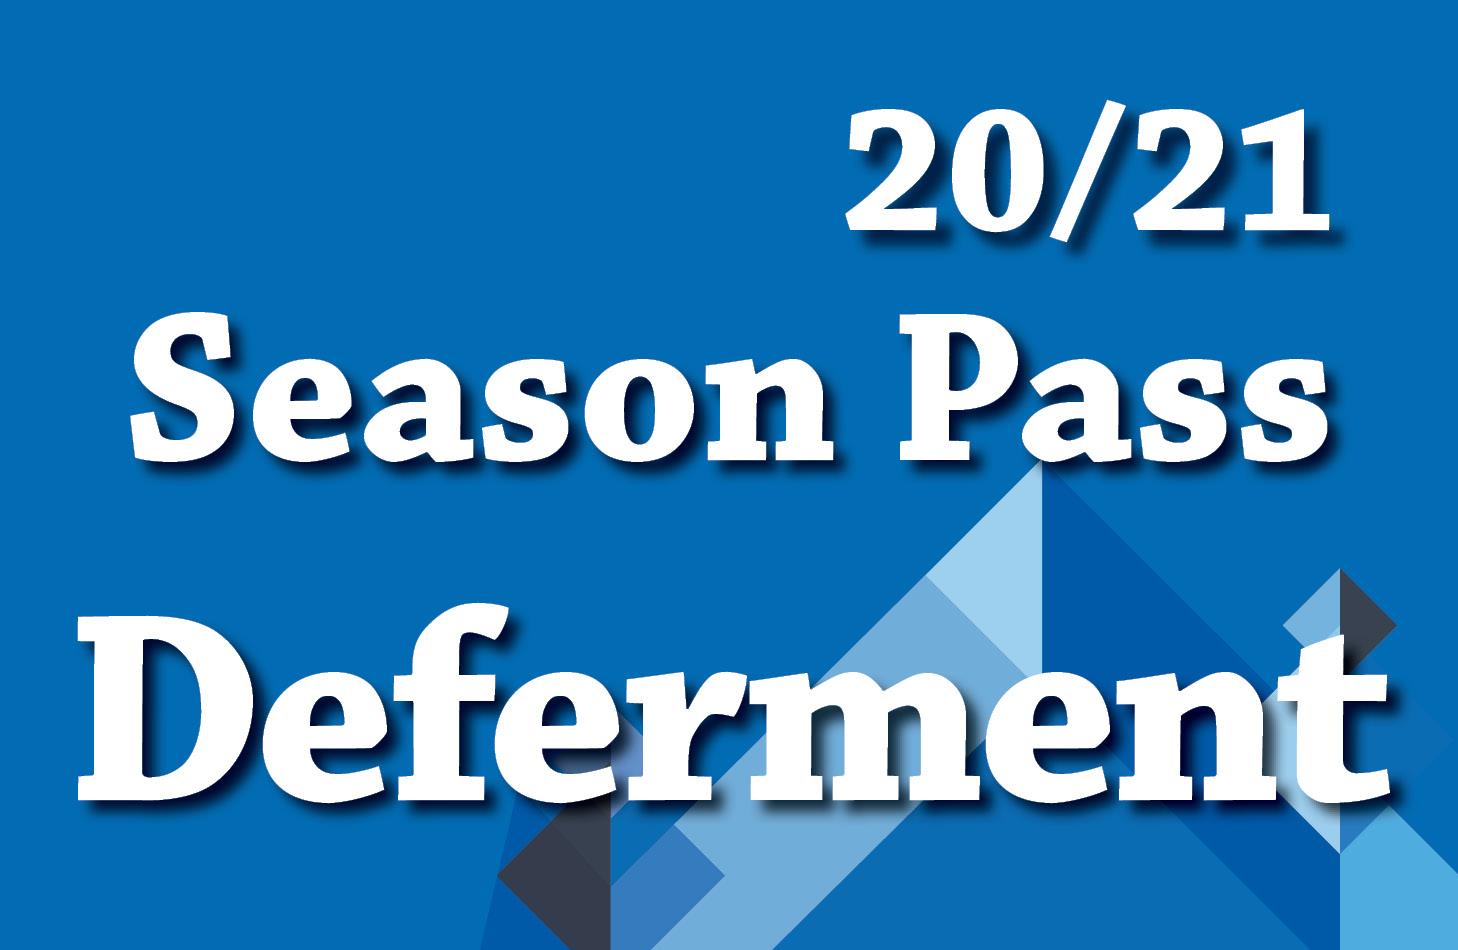 20-21 Season Pass Deferment